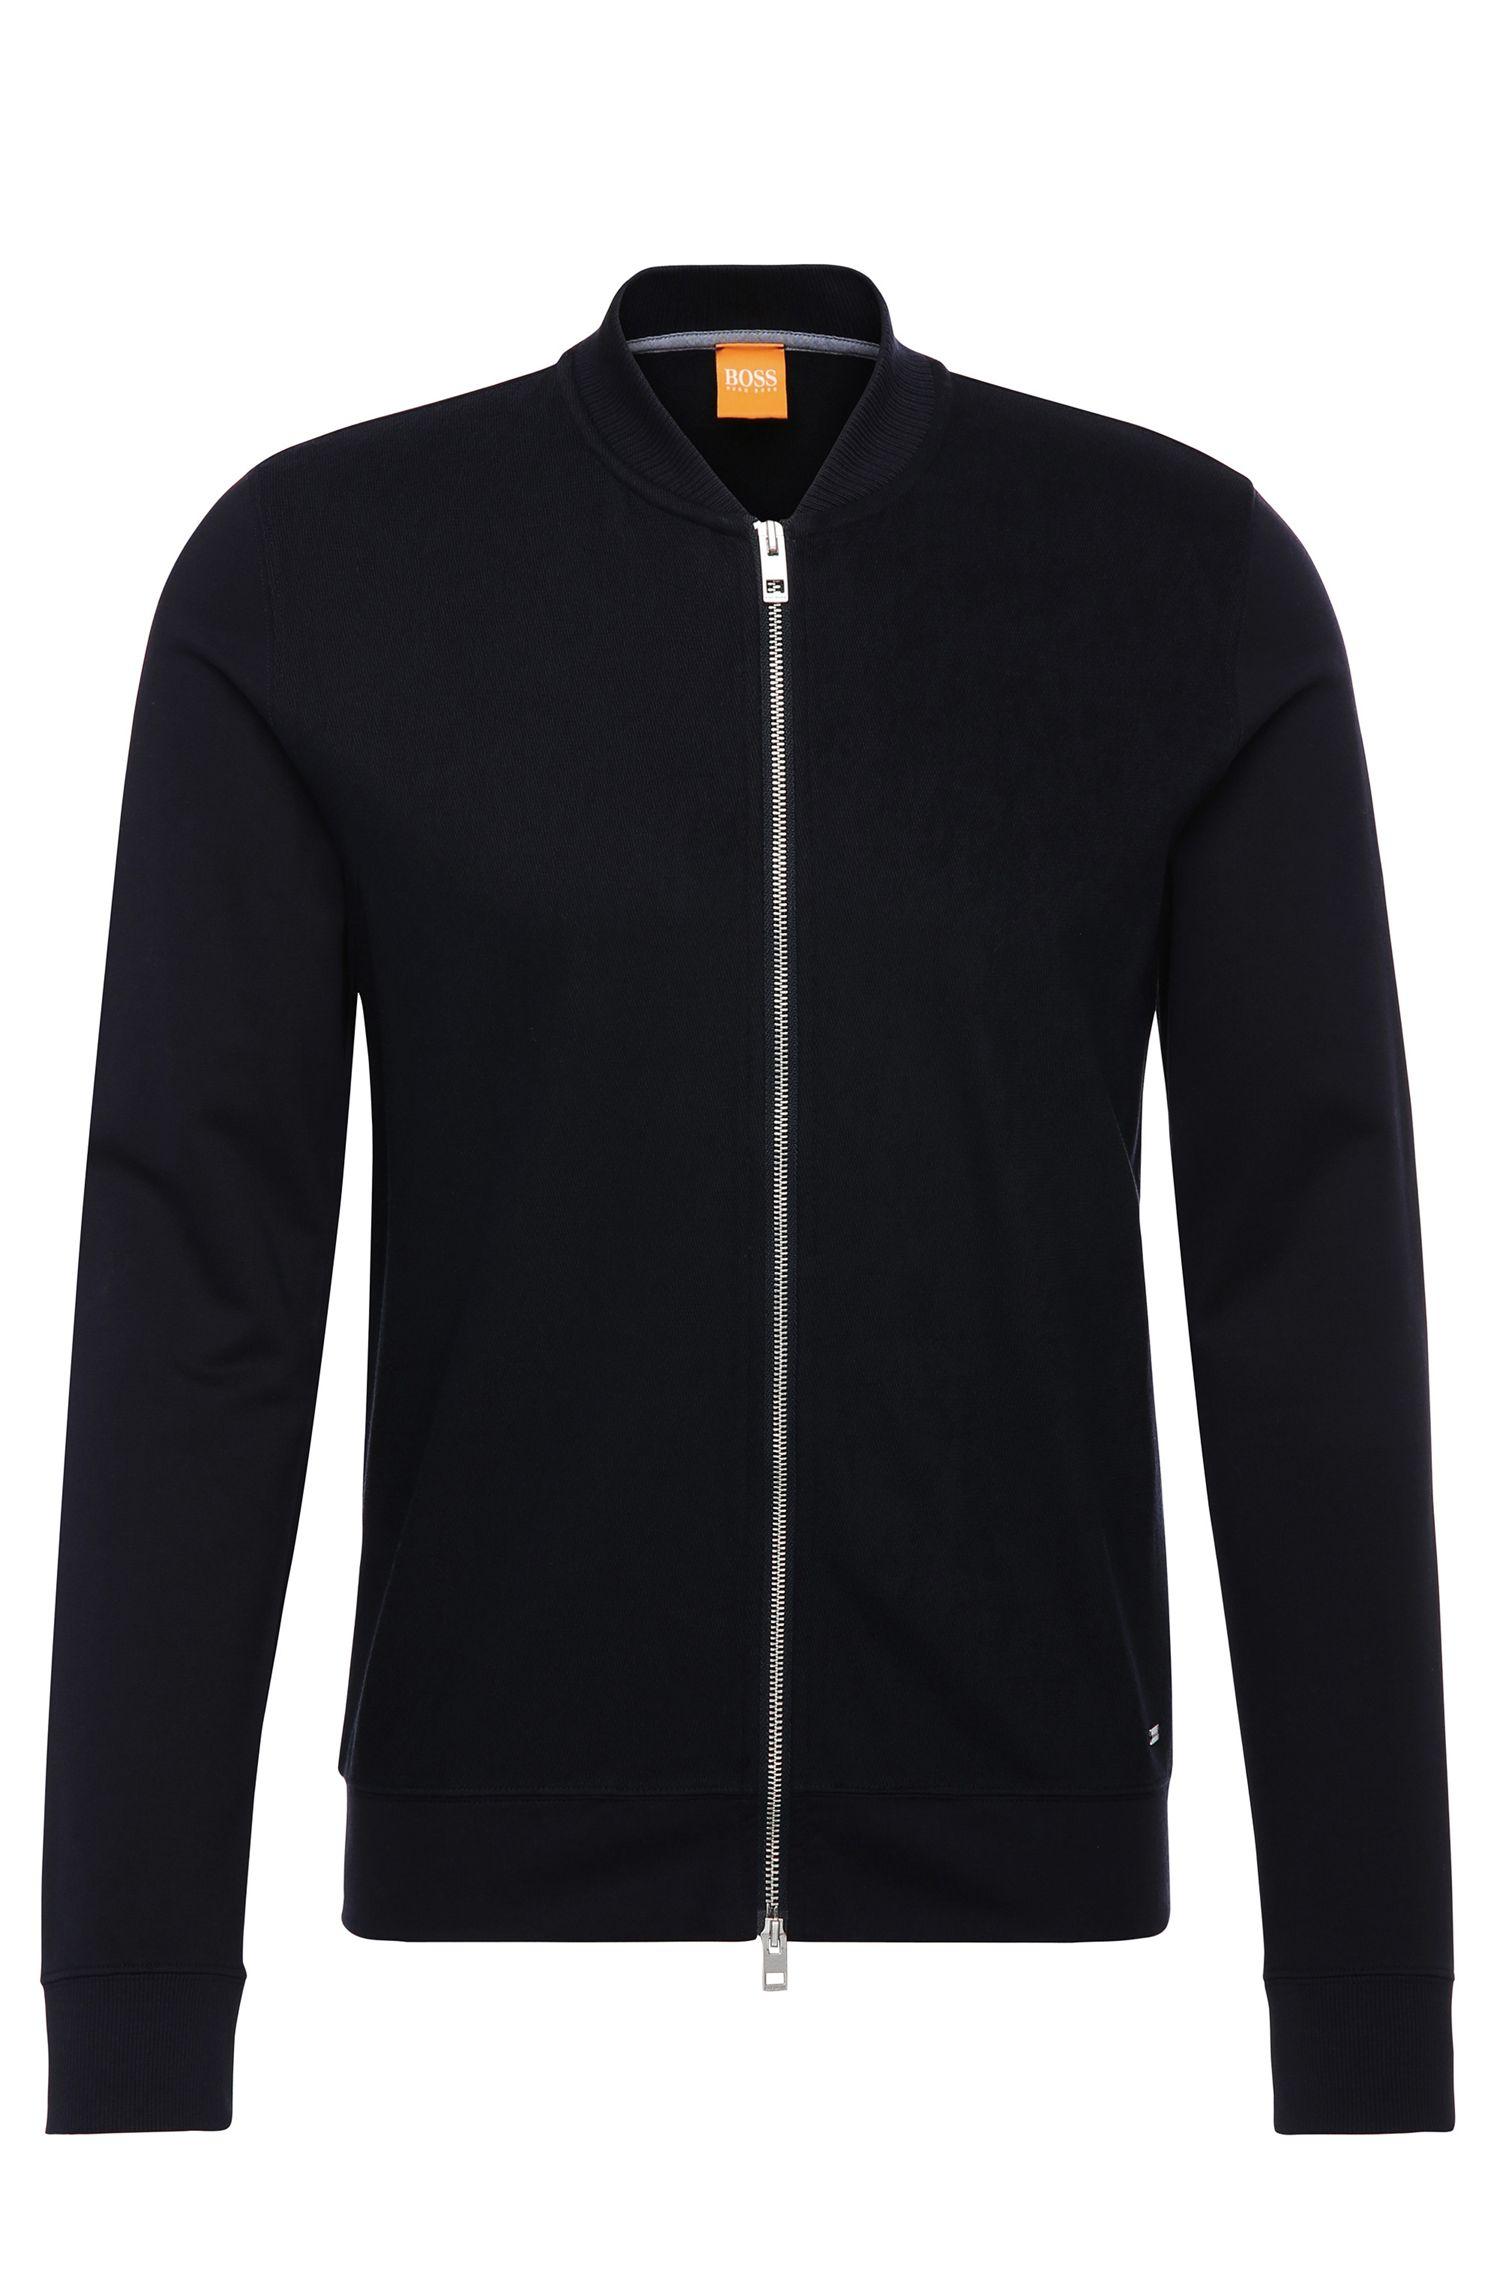 Regular-fit sweatshirt jacket in cotton: 'Ztripe'